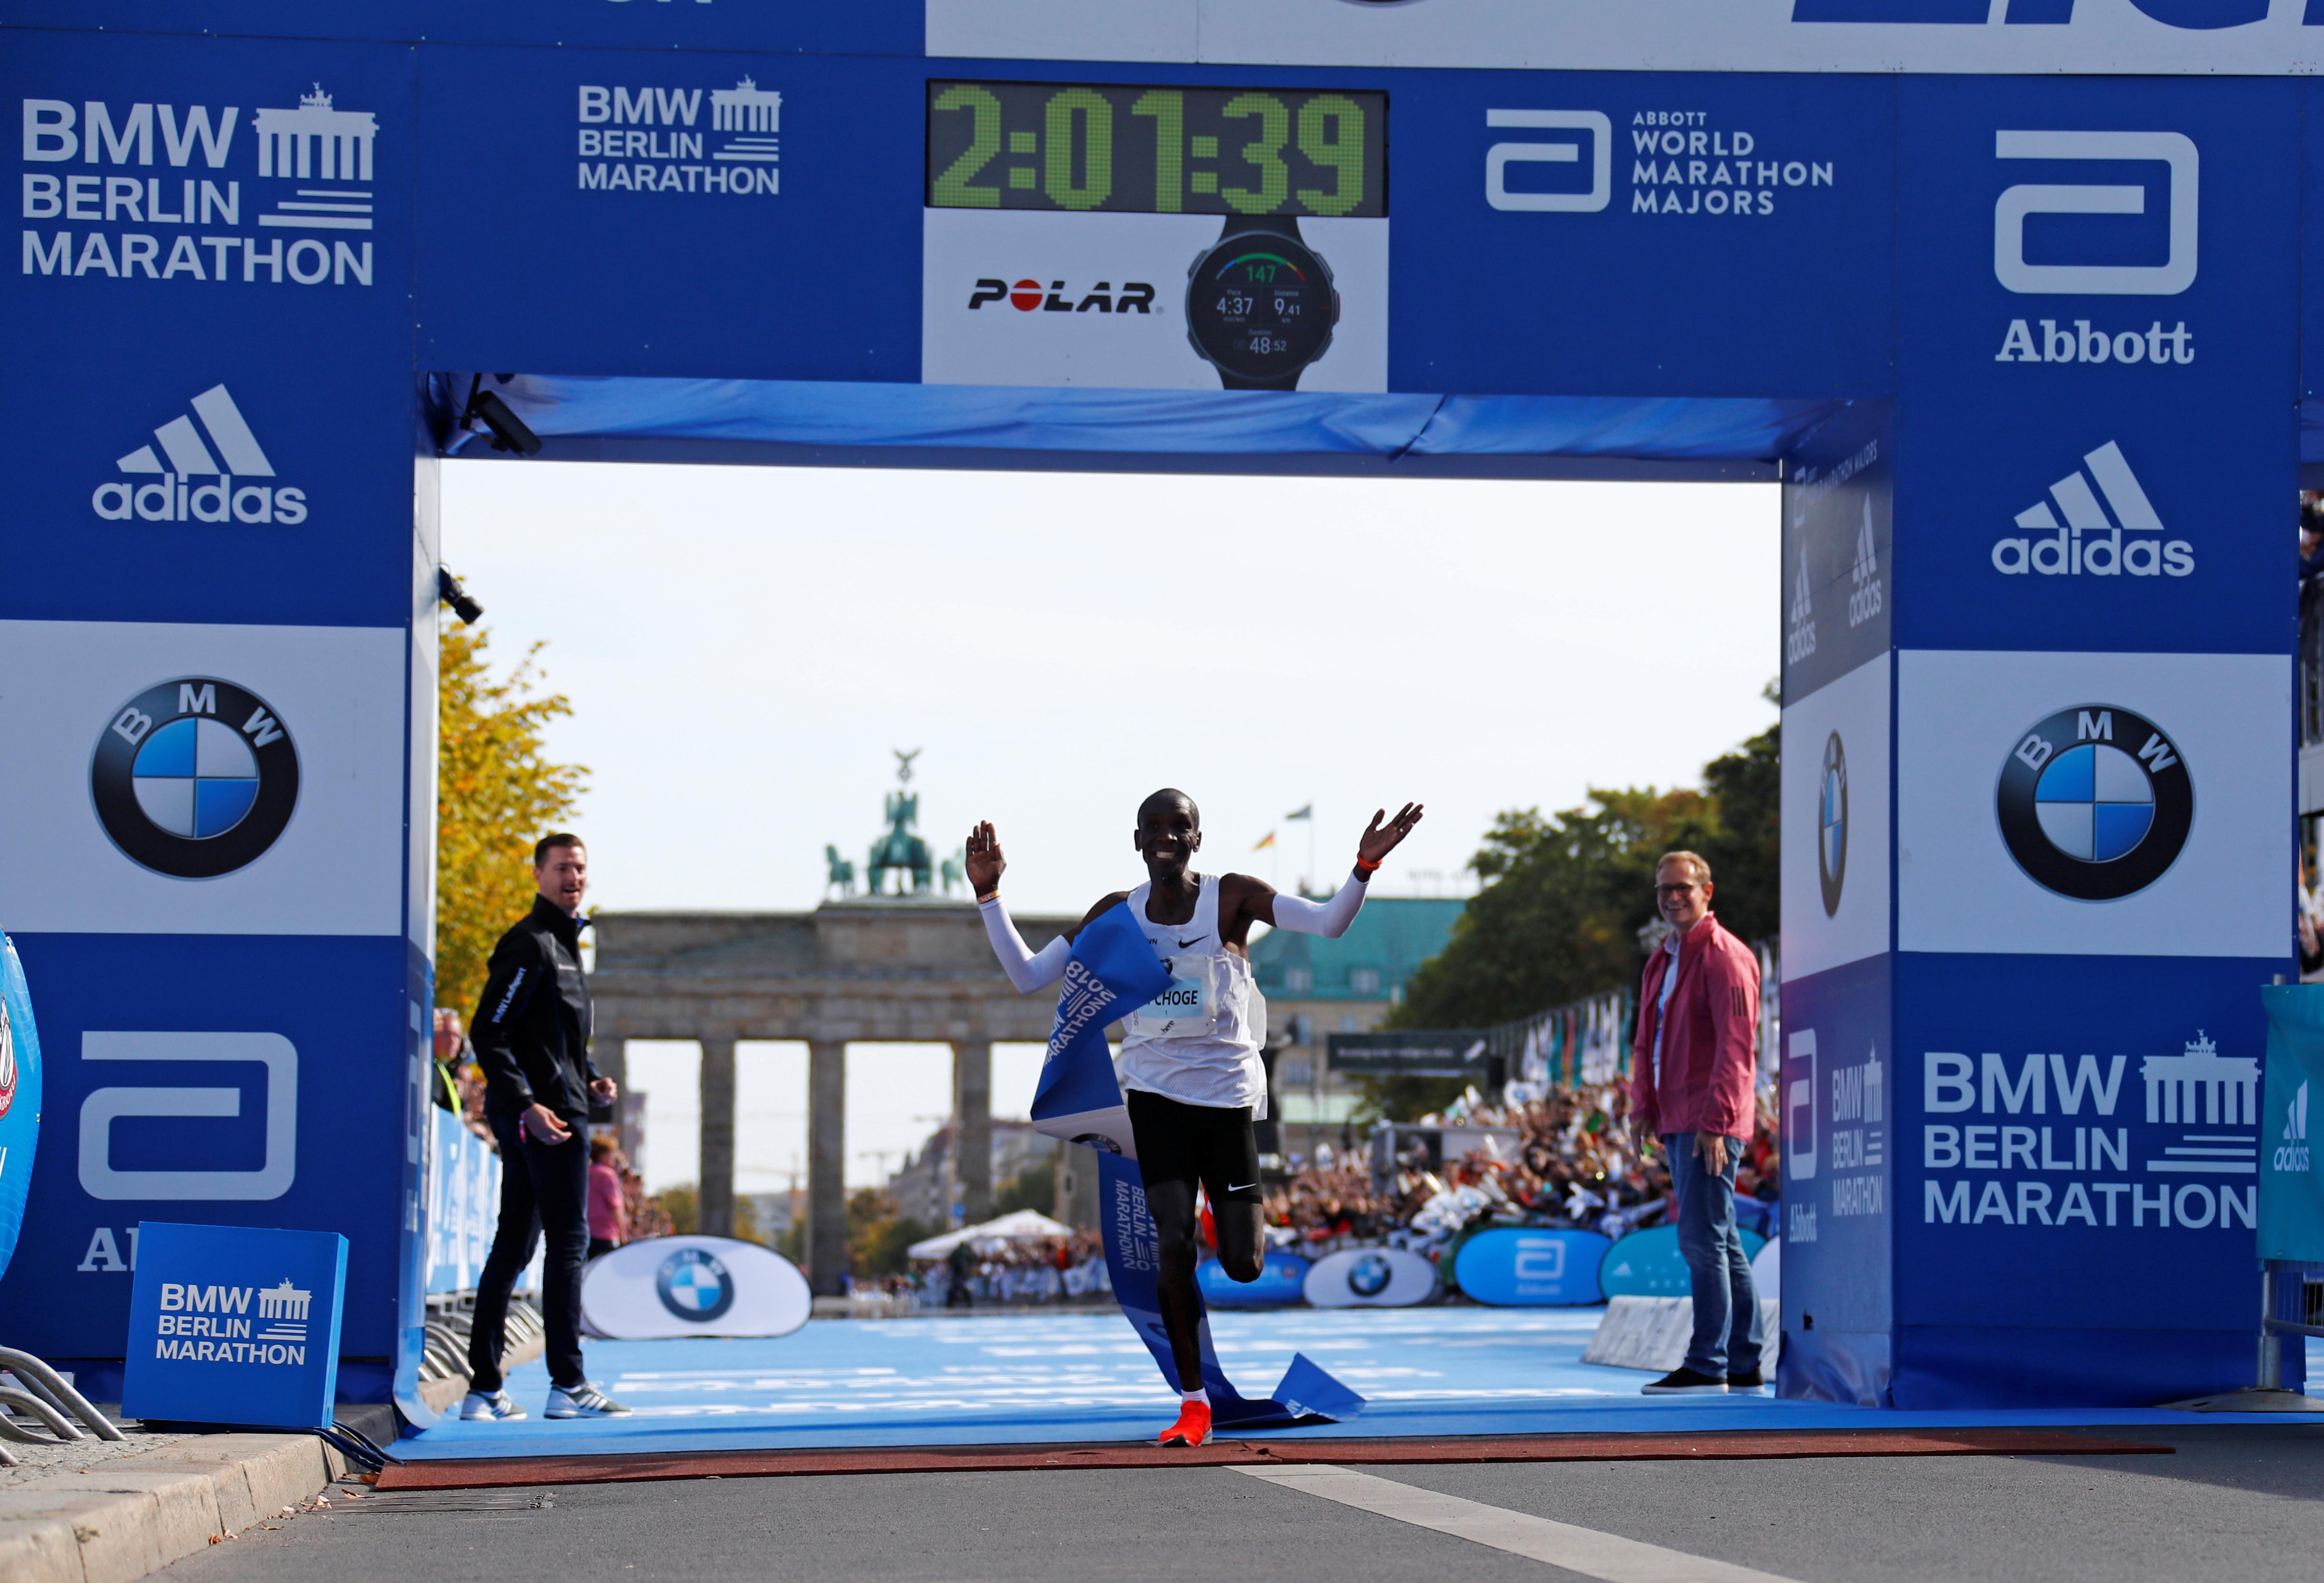 Kipchoge's Berlin world record will mean faster marathons